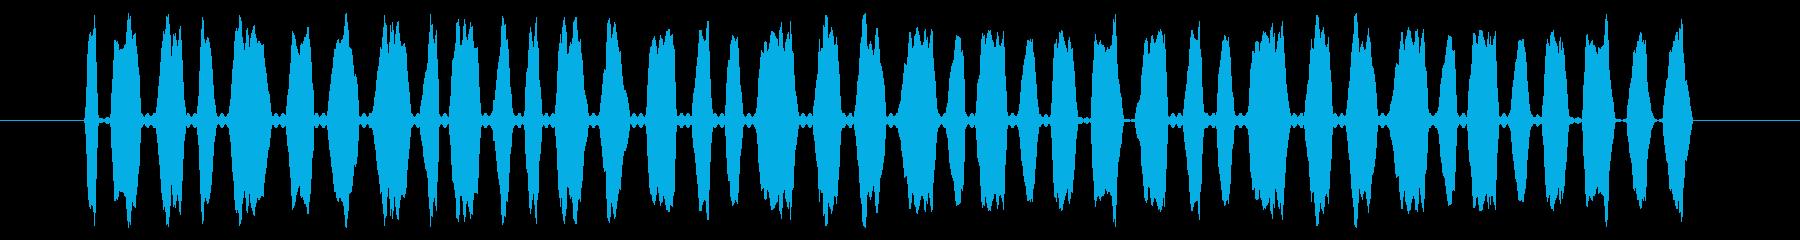 【NES RPG01-08(メッセージ)の再生済みの波形